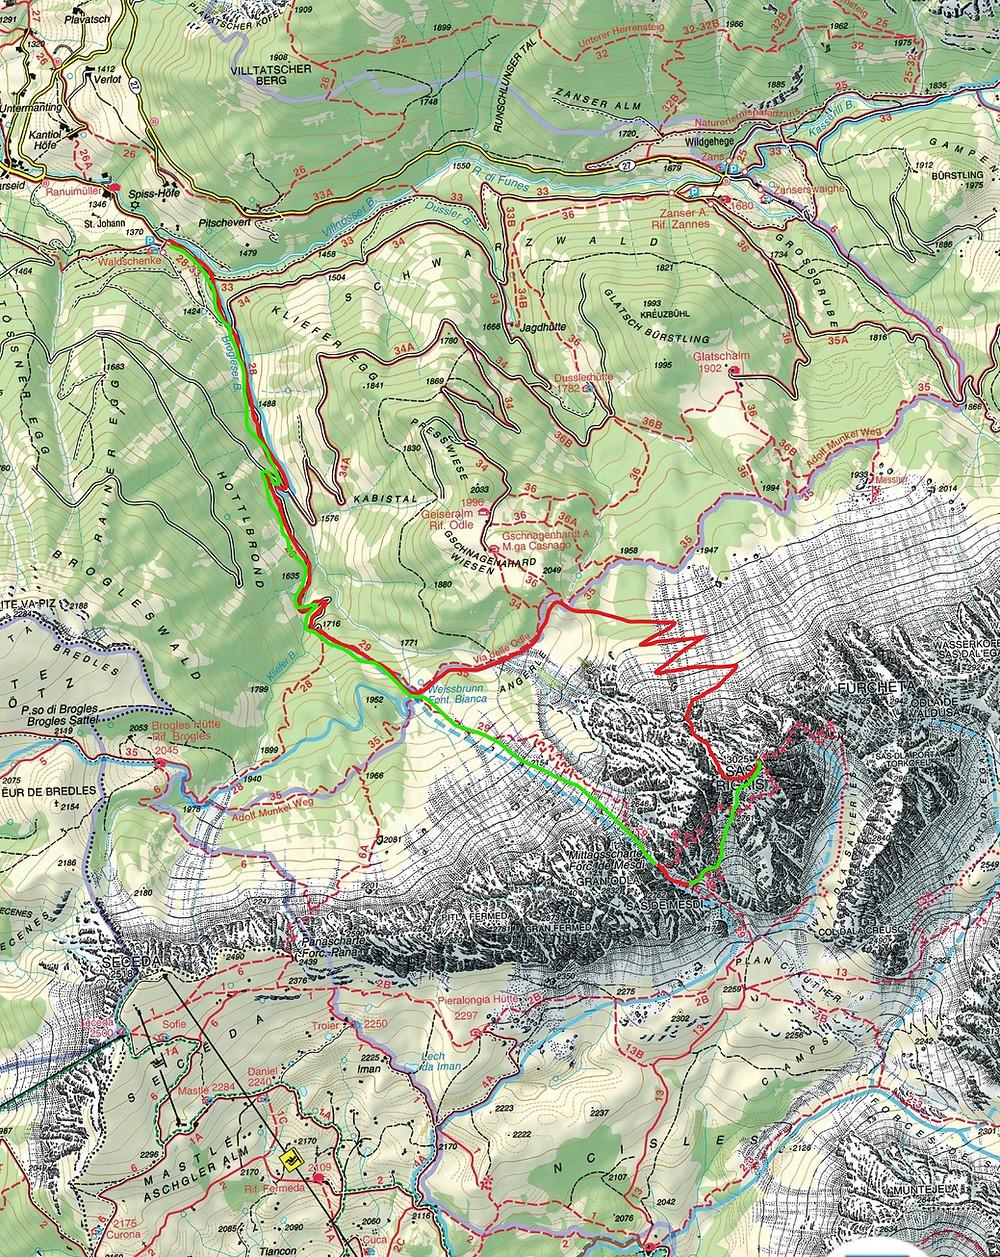 Karte Sas Rigais Sass Rigais Wegbeschreibung Nordwestrinne Skitour